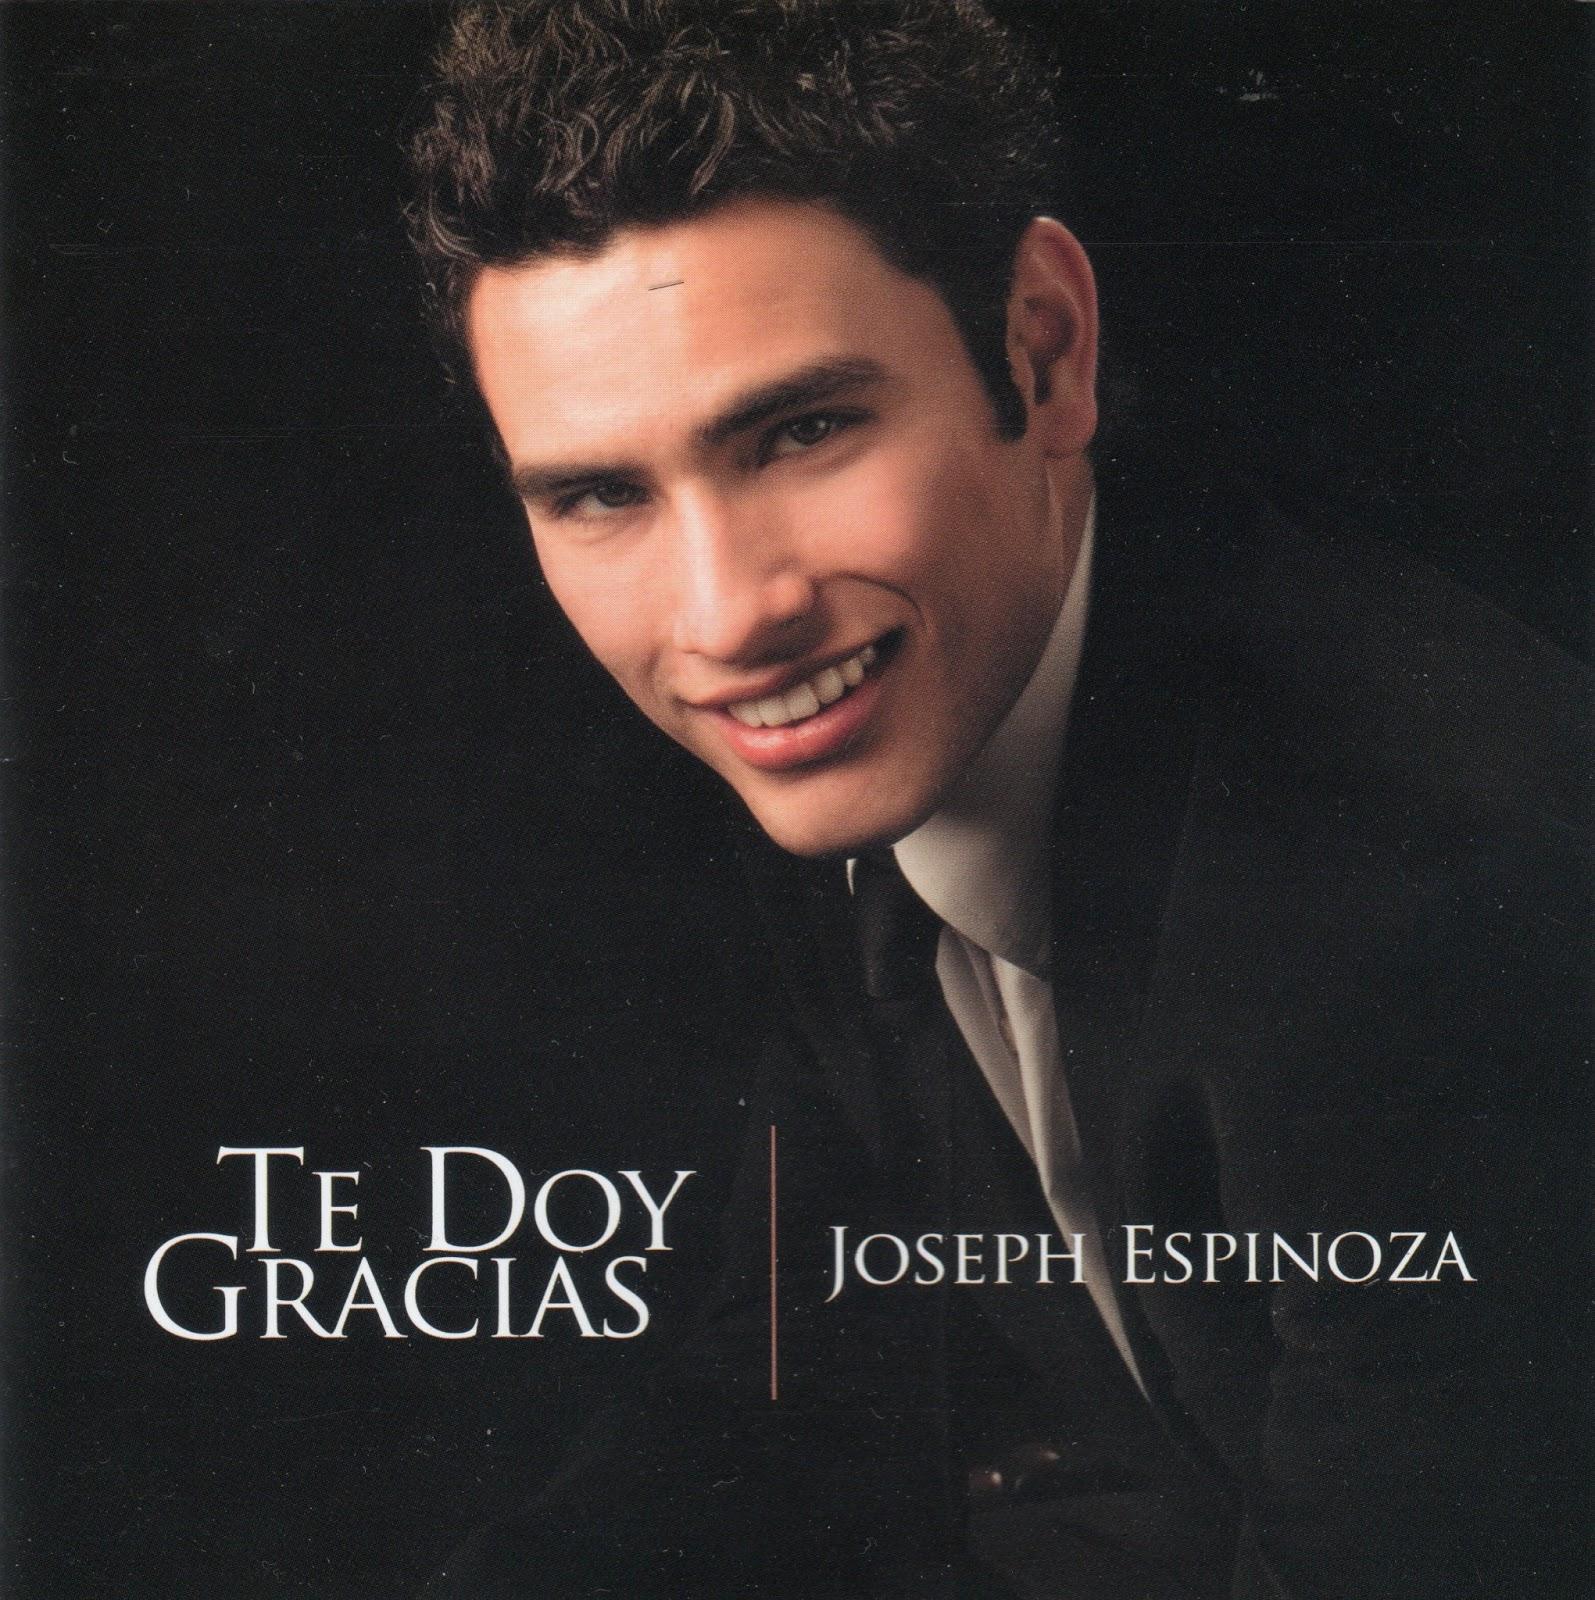 Joseph Espinoza-Te Doy Gracias-